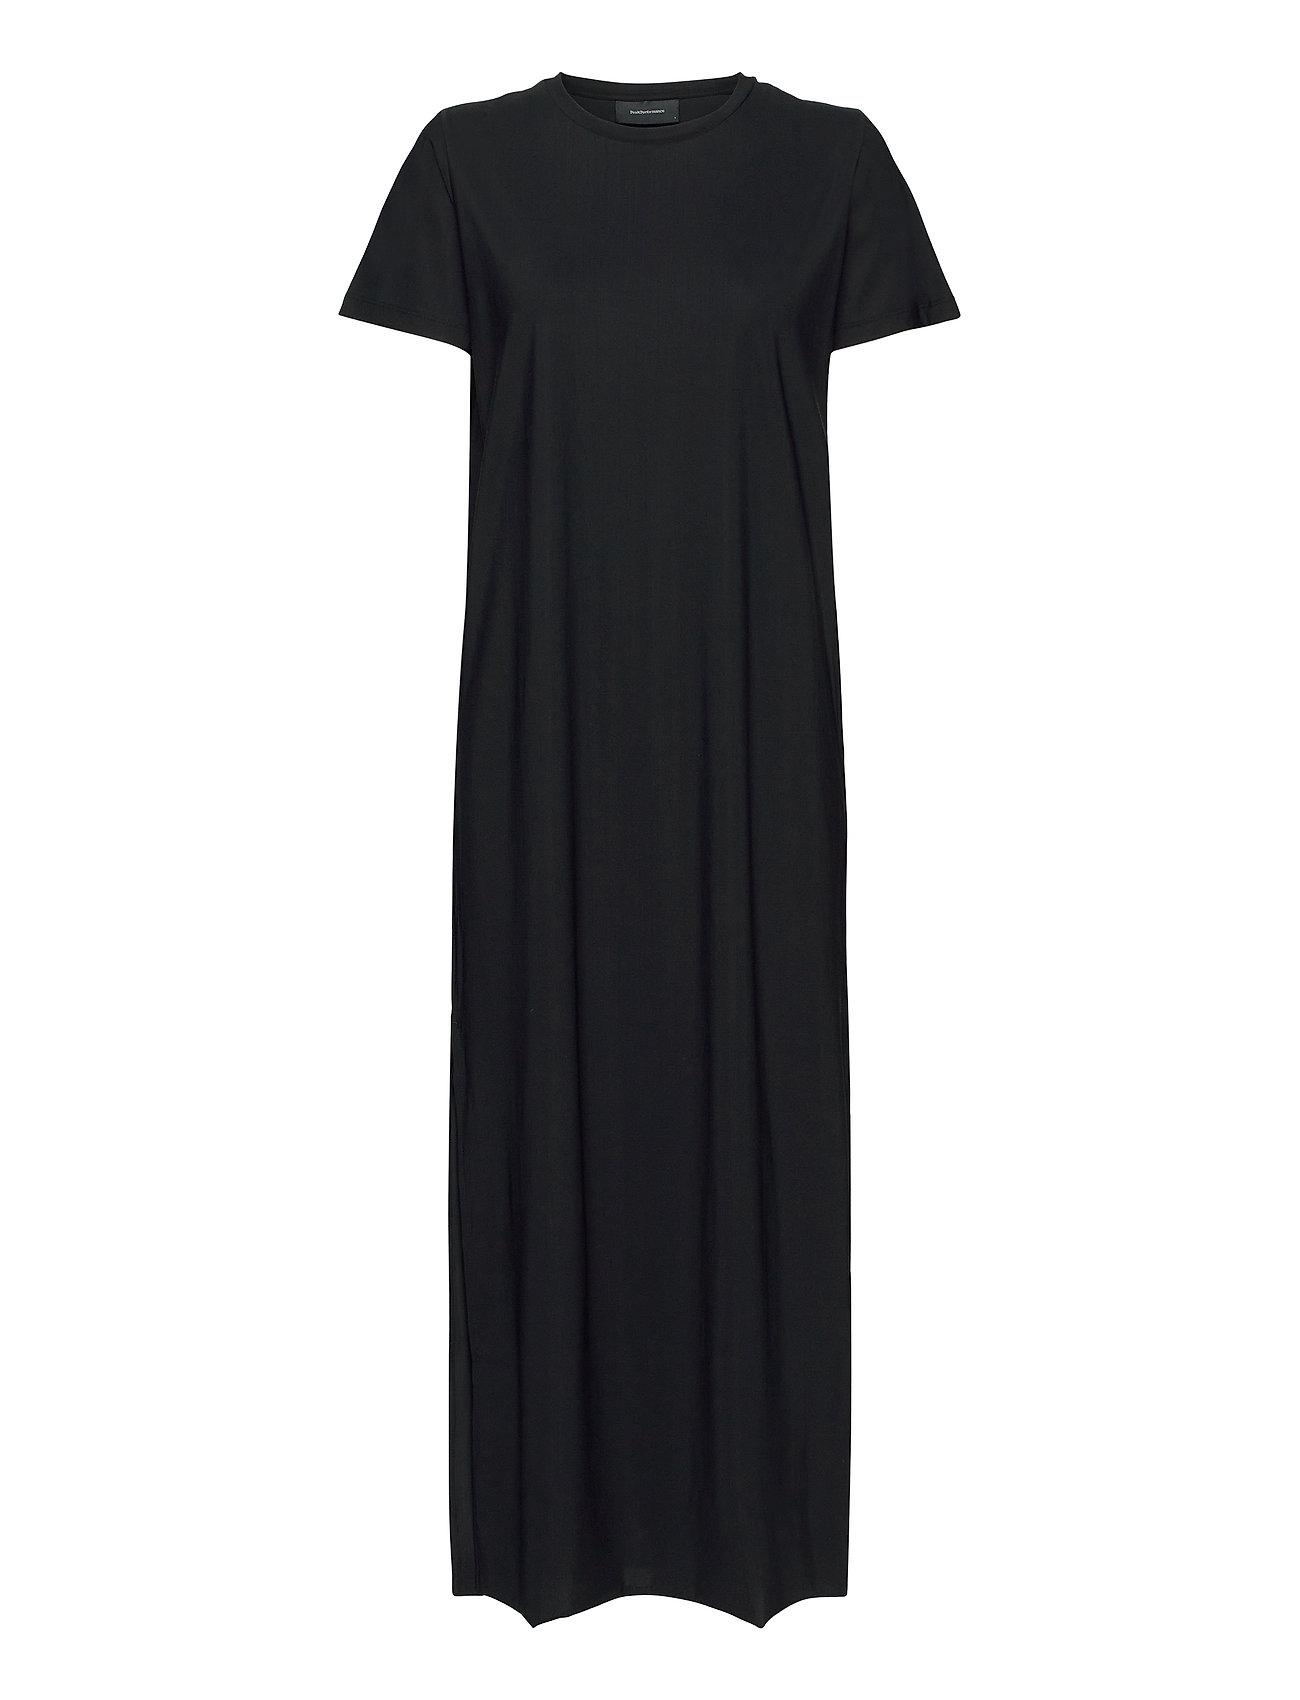 Image of W Sense Tee Dress Maxikjole Festkjole Sort Peak Performance (3421209201)